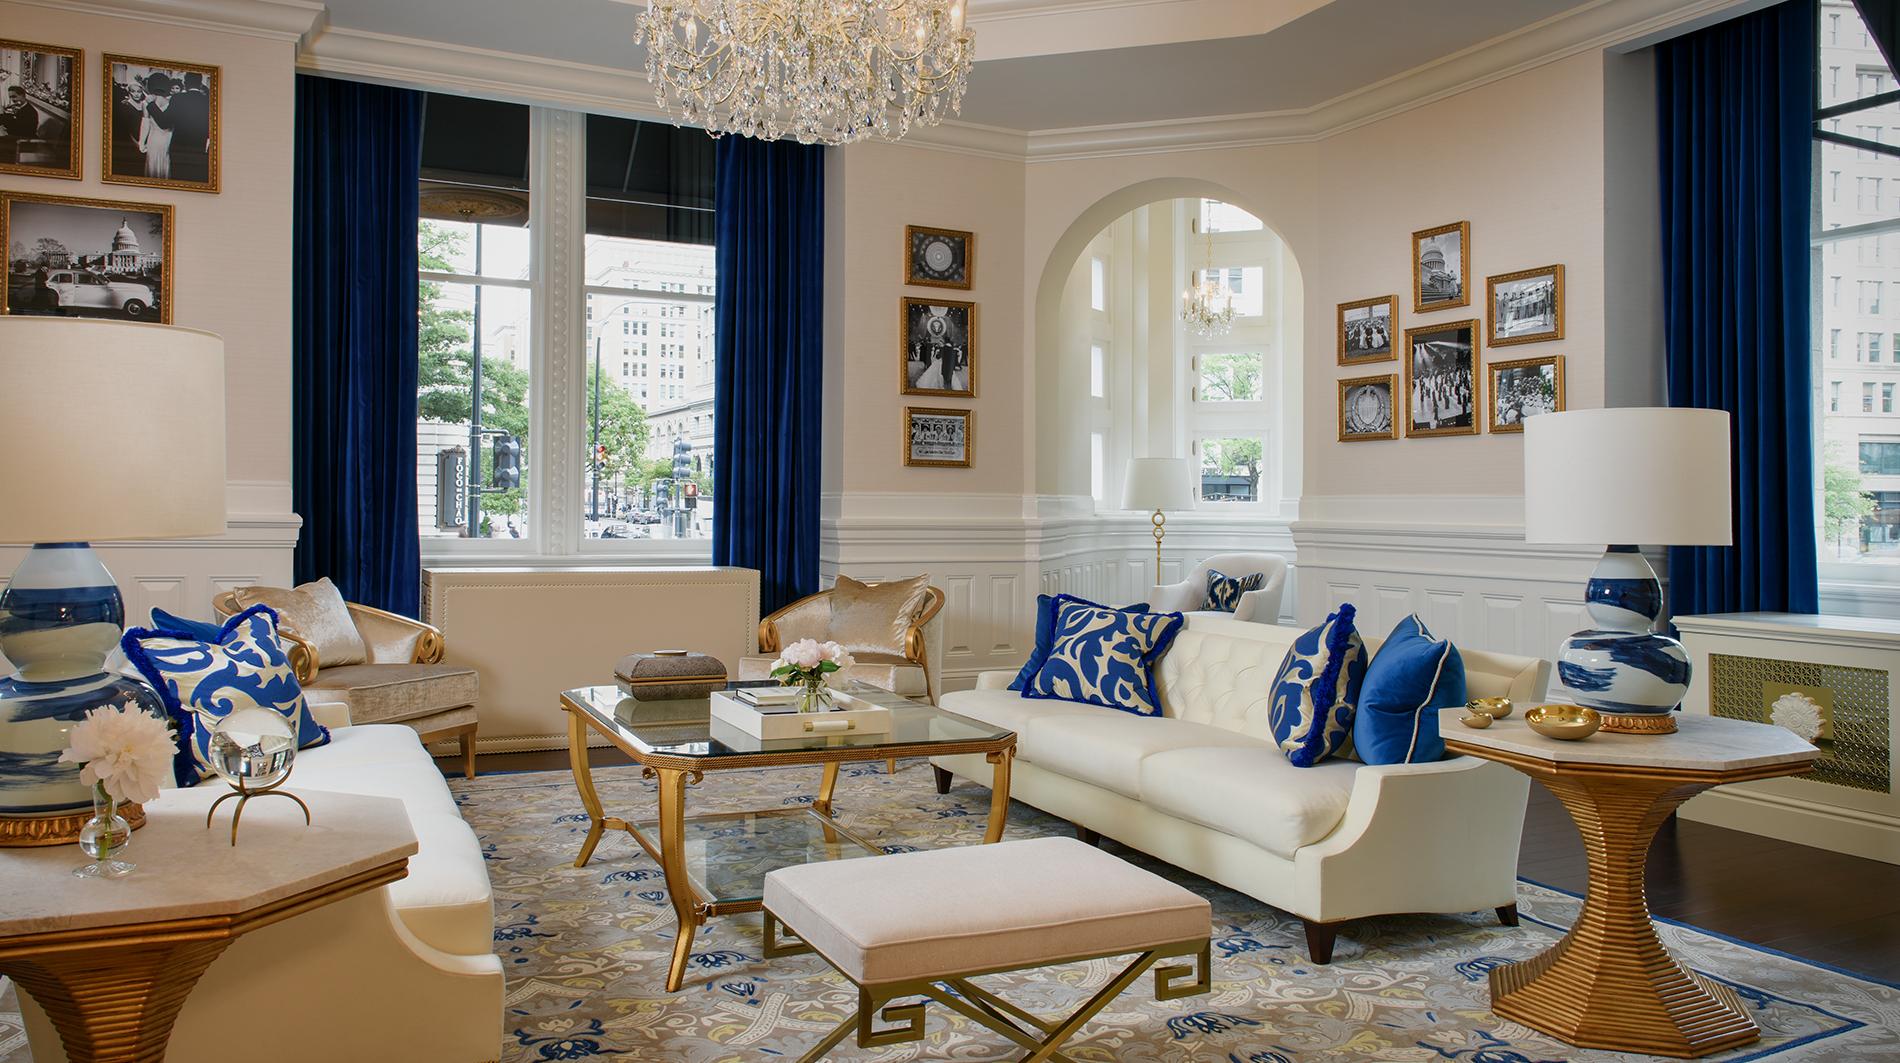 Trump international hotel washington dc Benjamin trump townhouse